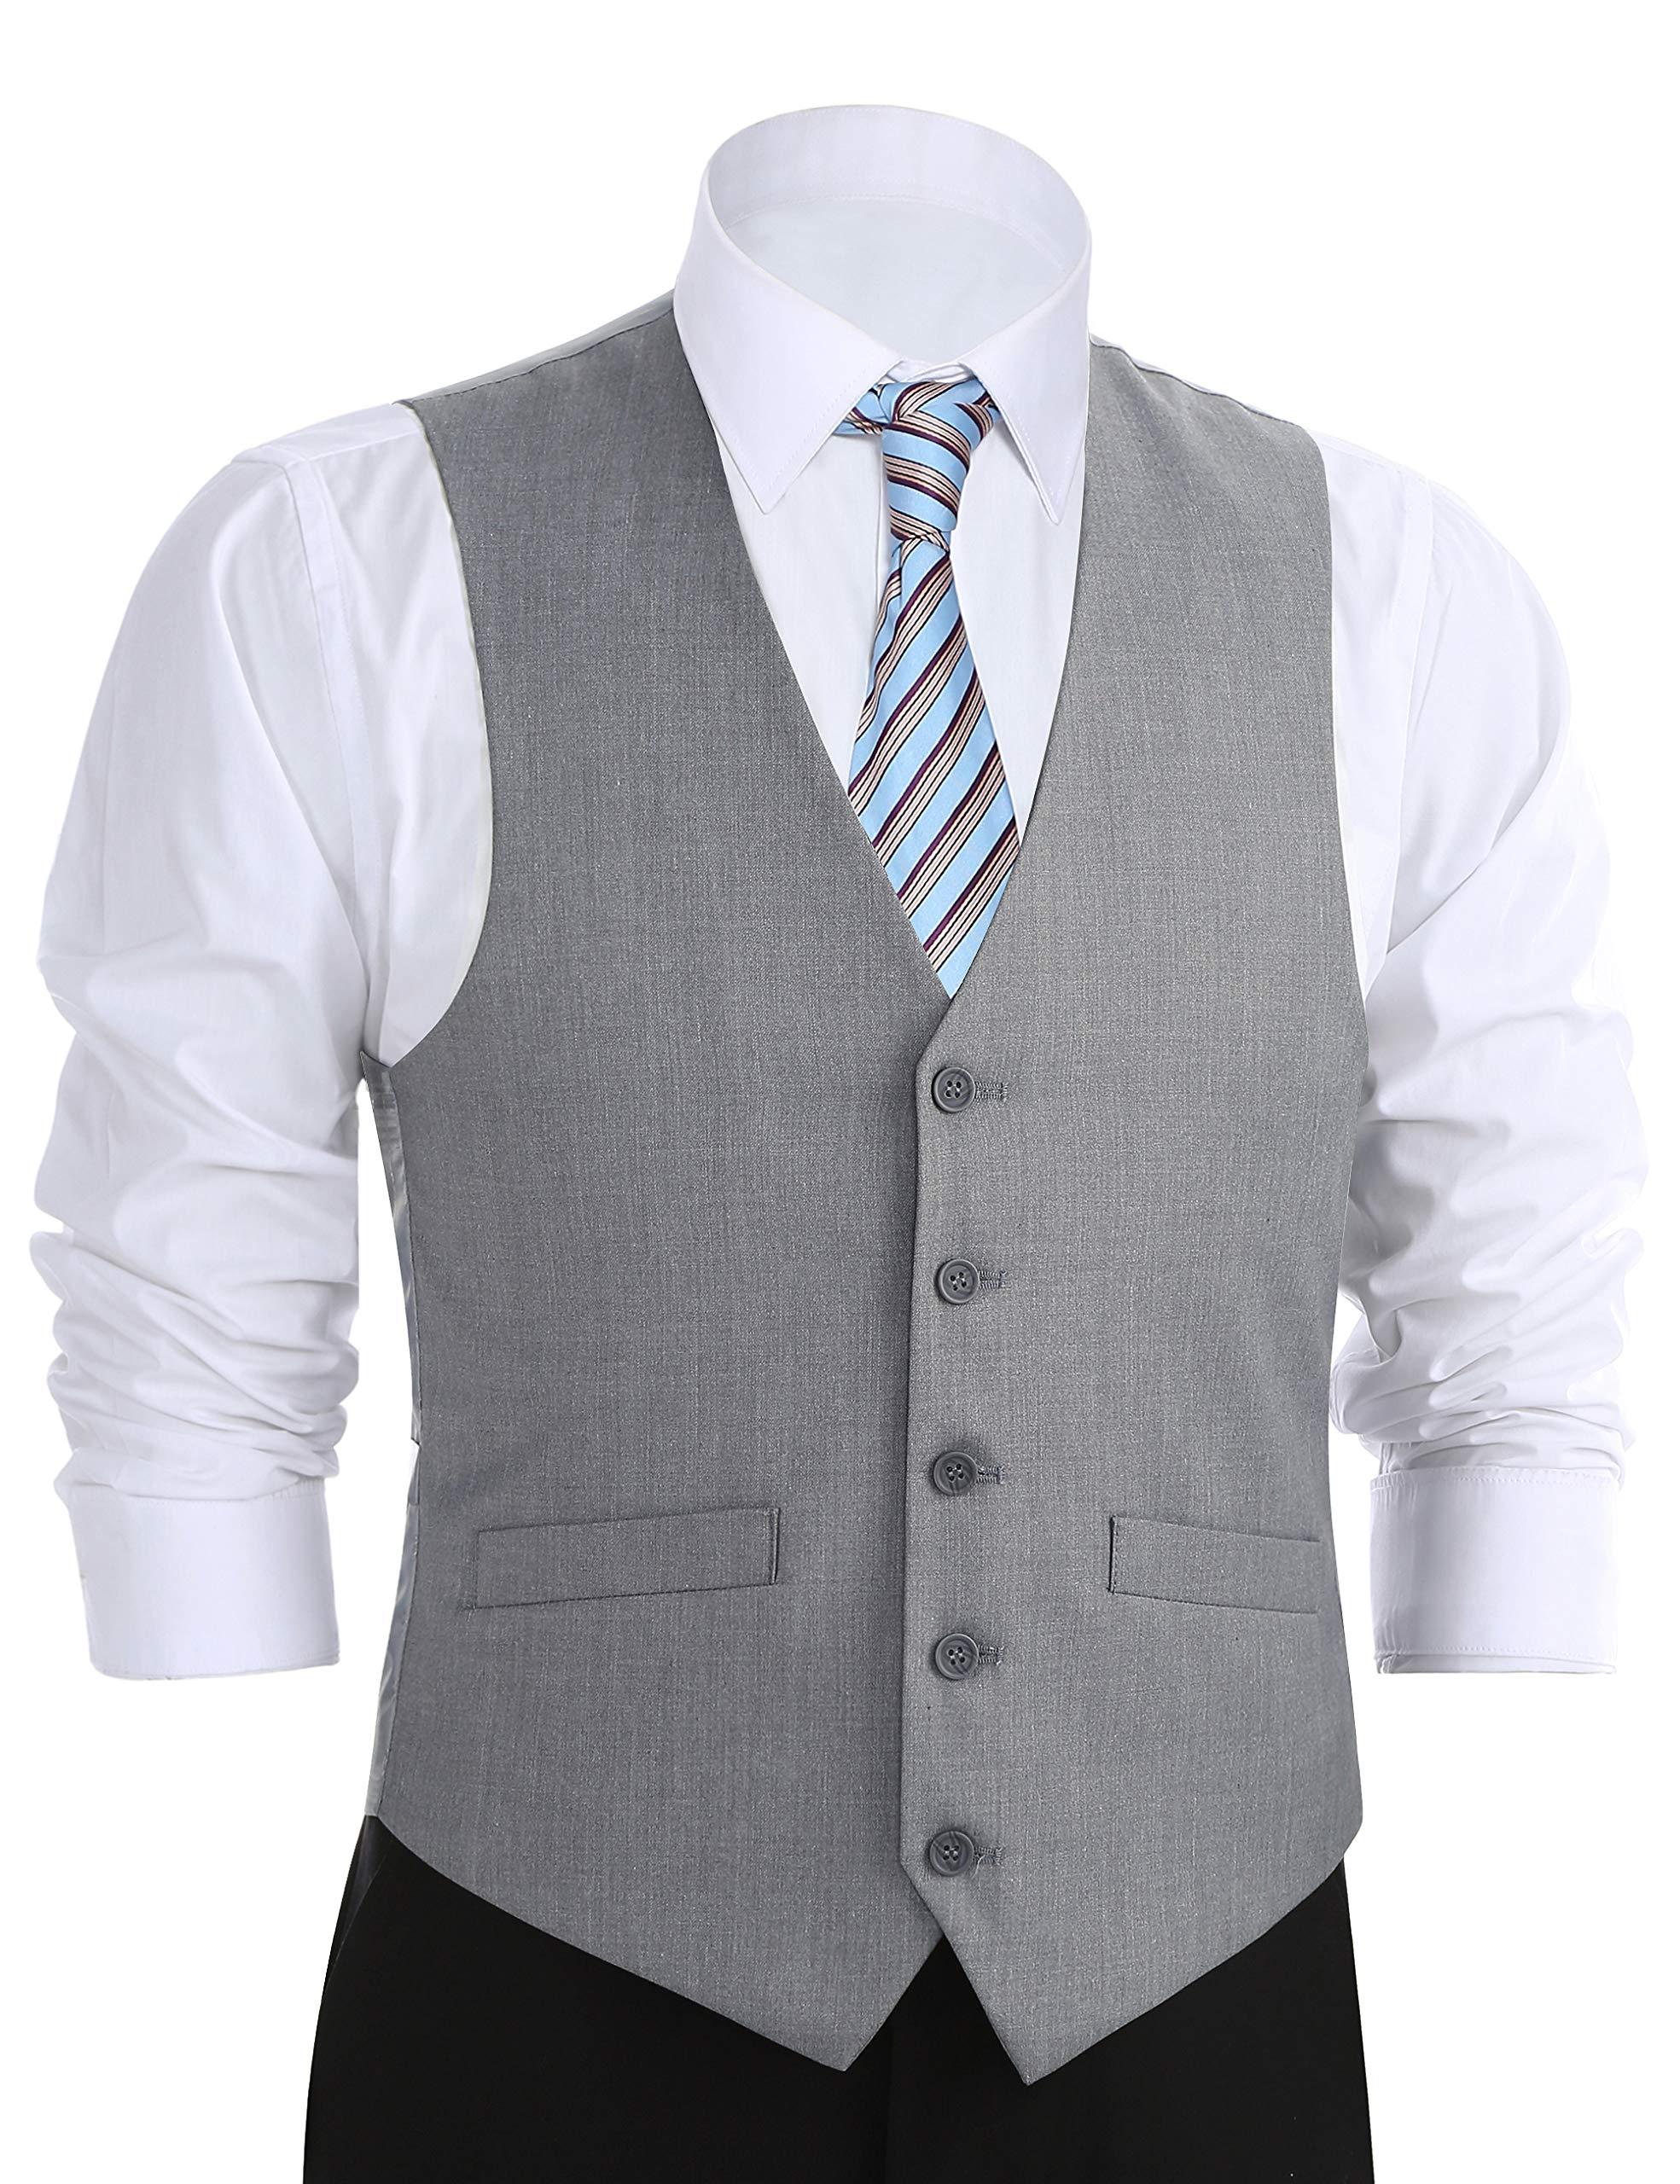 Chama Men's Formal Classic Fit Business Dress Suit Button Down Vest Waistcoat (44 Regular, Light Grey)